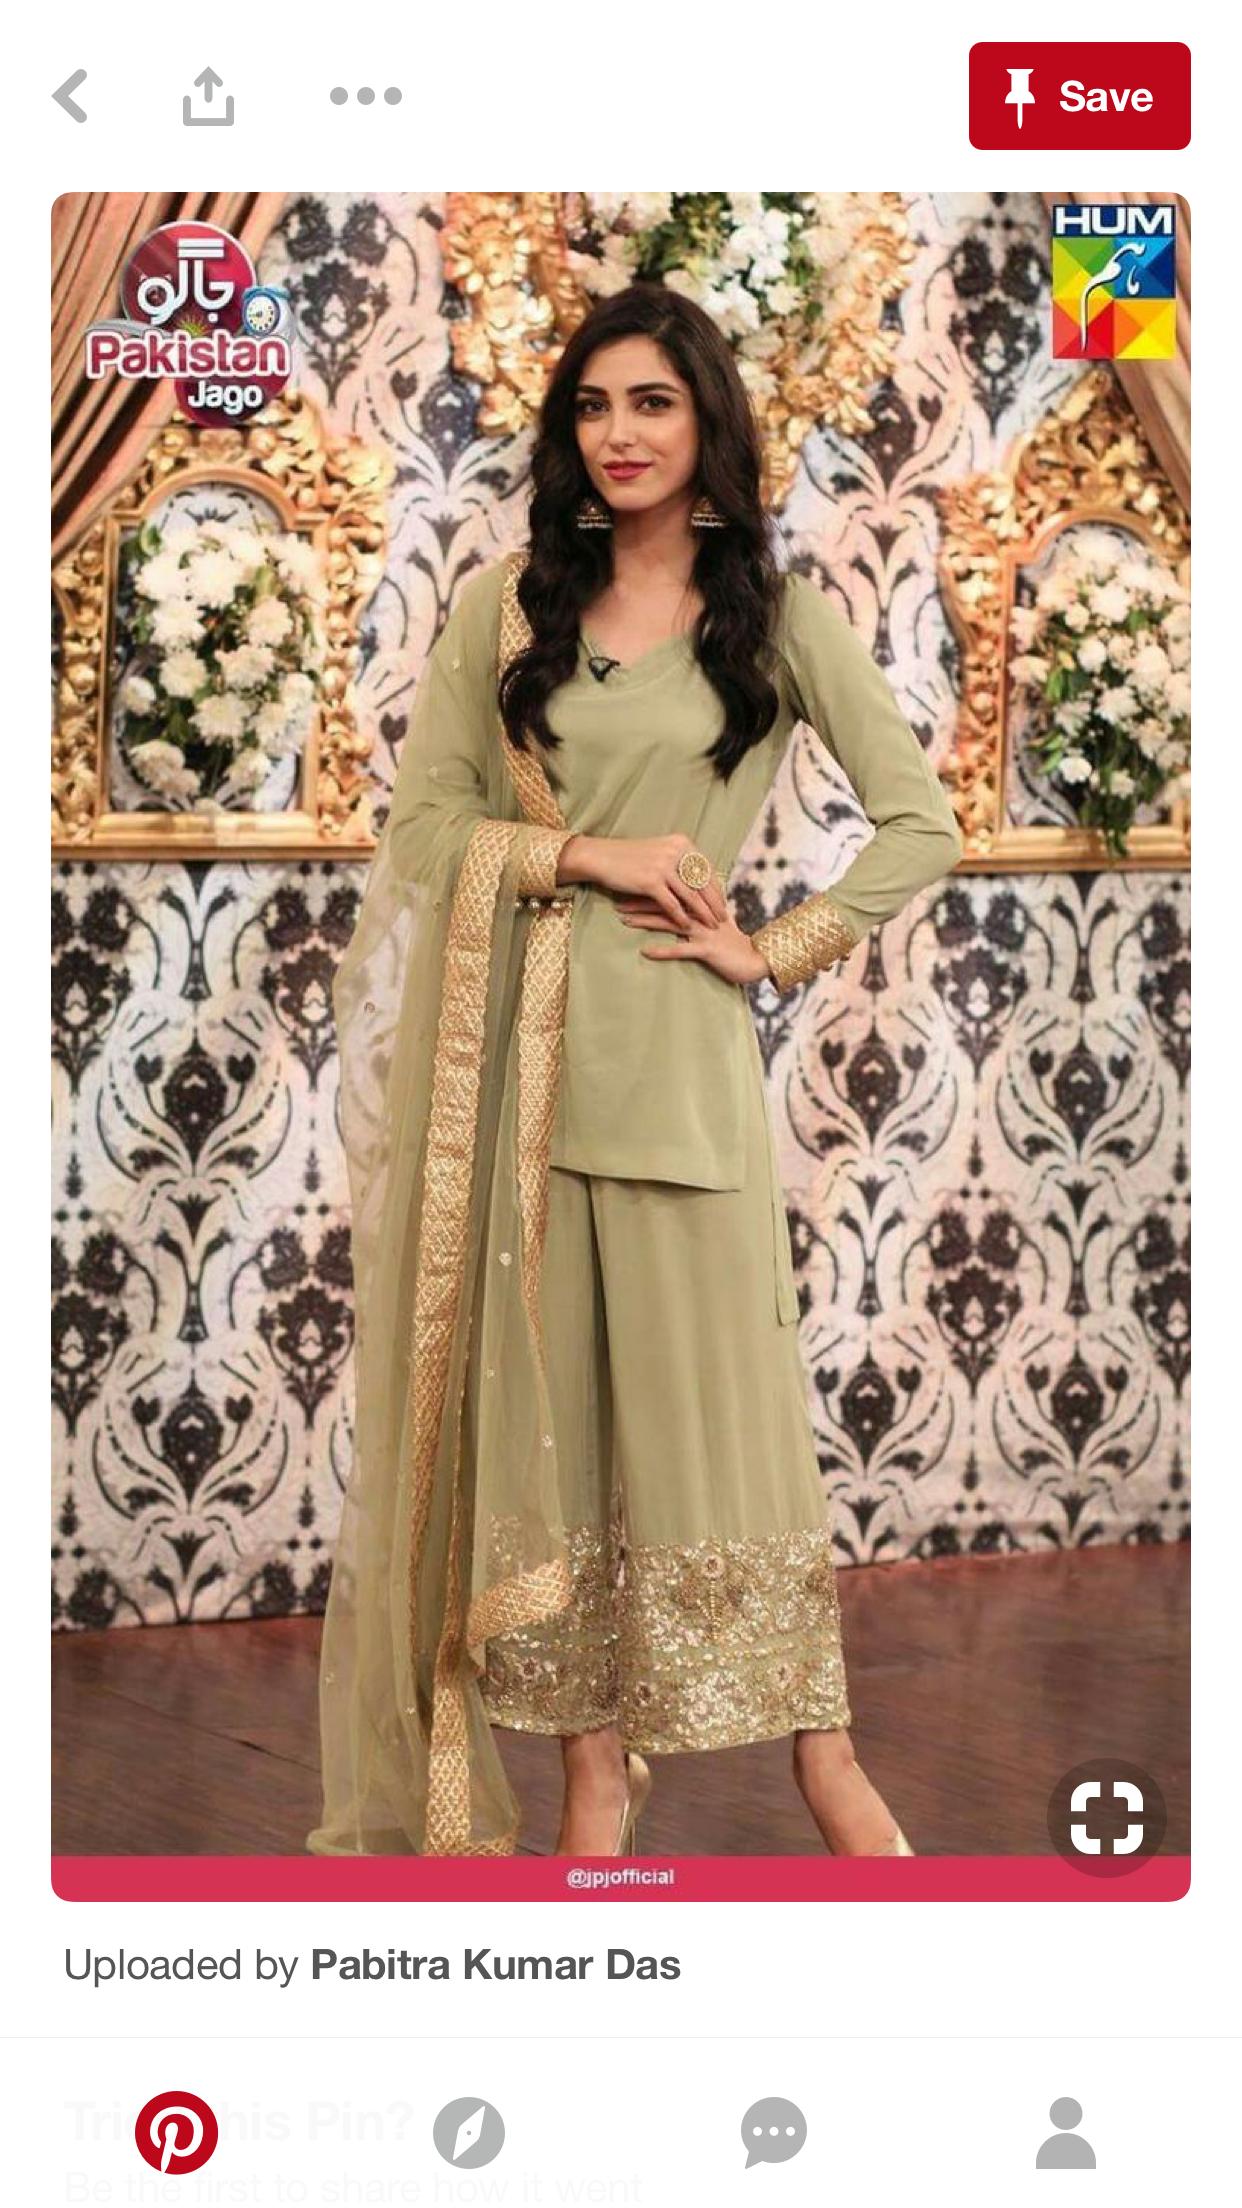 Pin by zainab alnakkas on pakistaniindian weddinguclothes